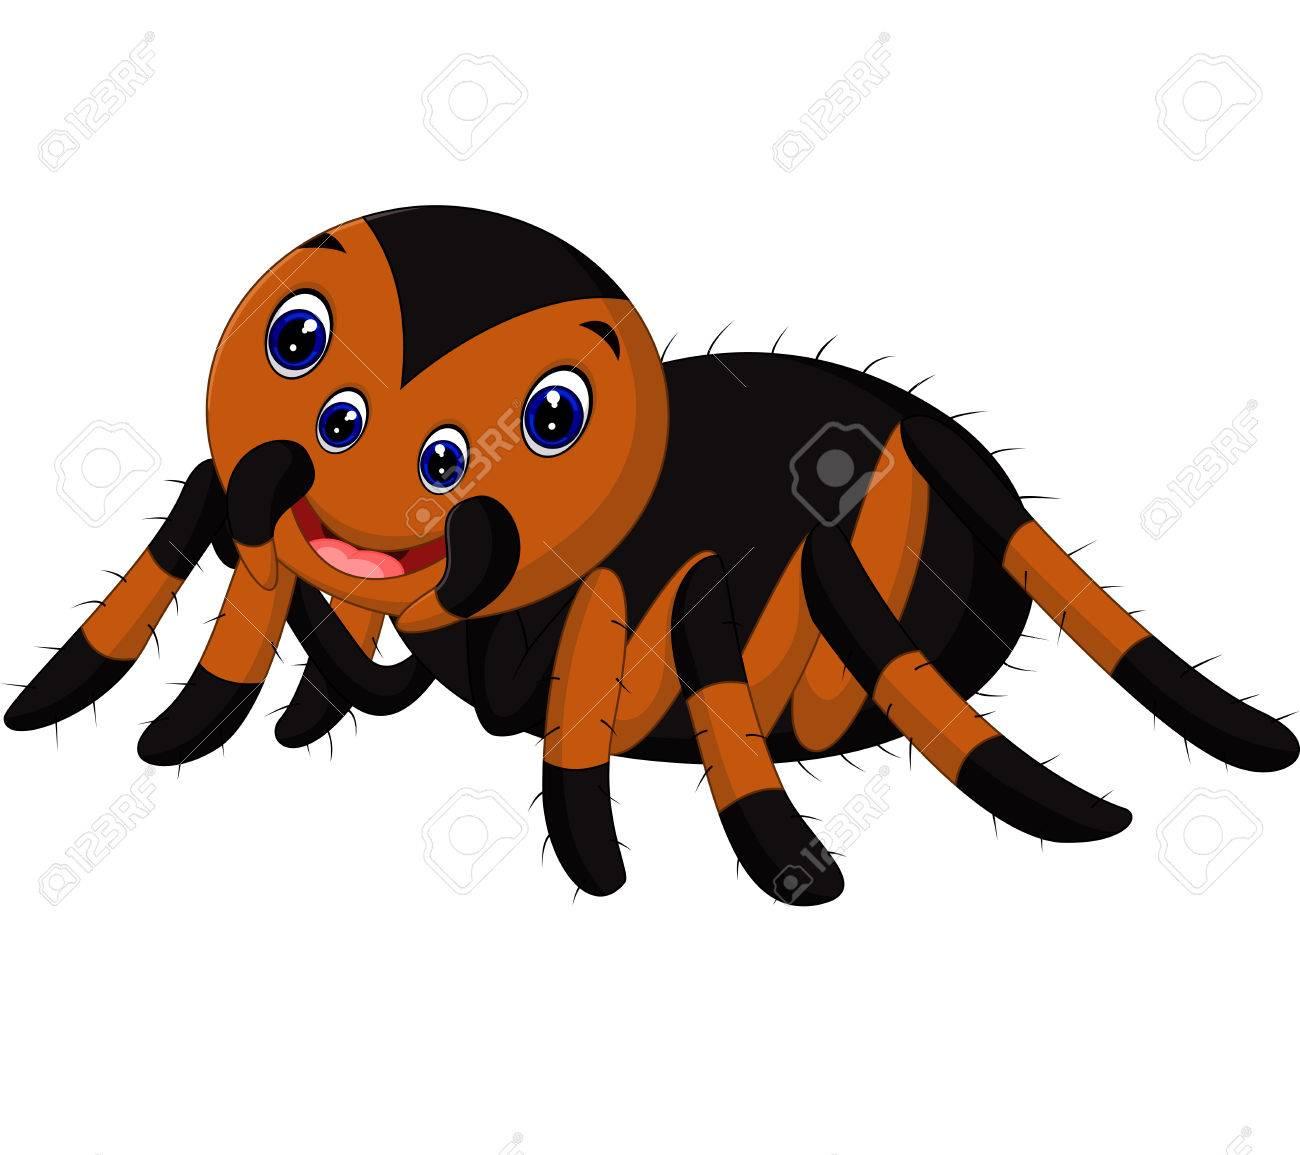 Cute Tarantula Cartoon Stock Photo, Picture And Royalty Free Image ...